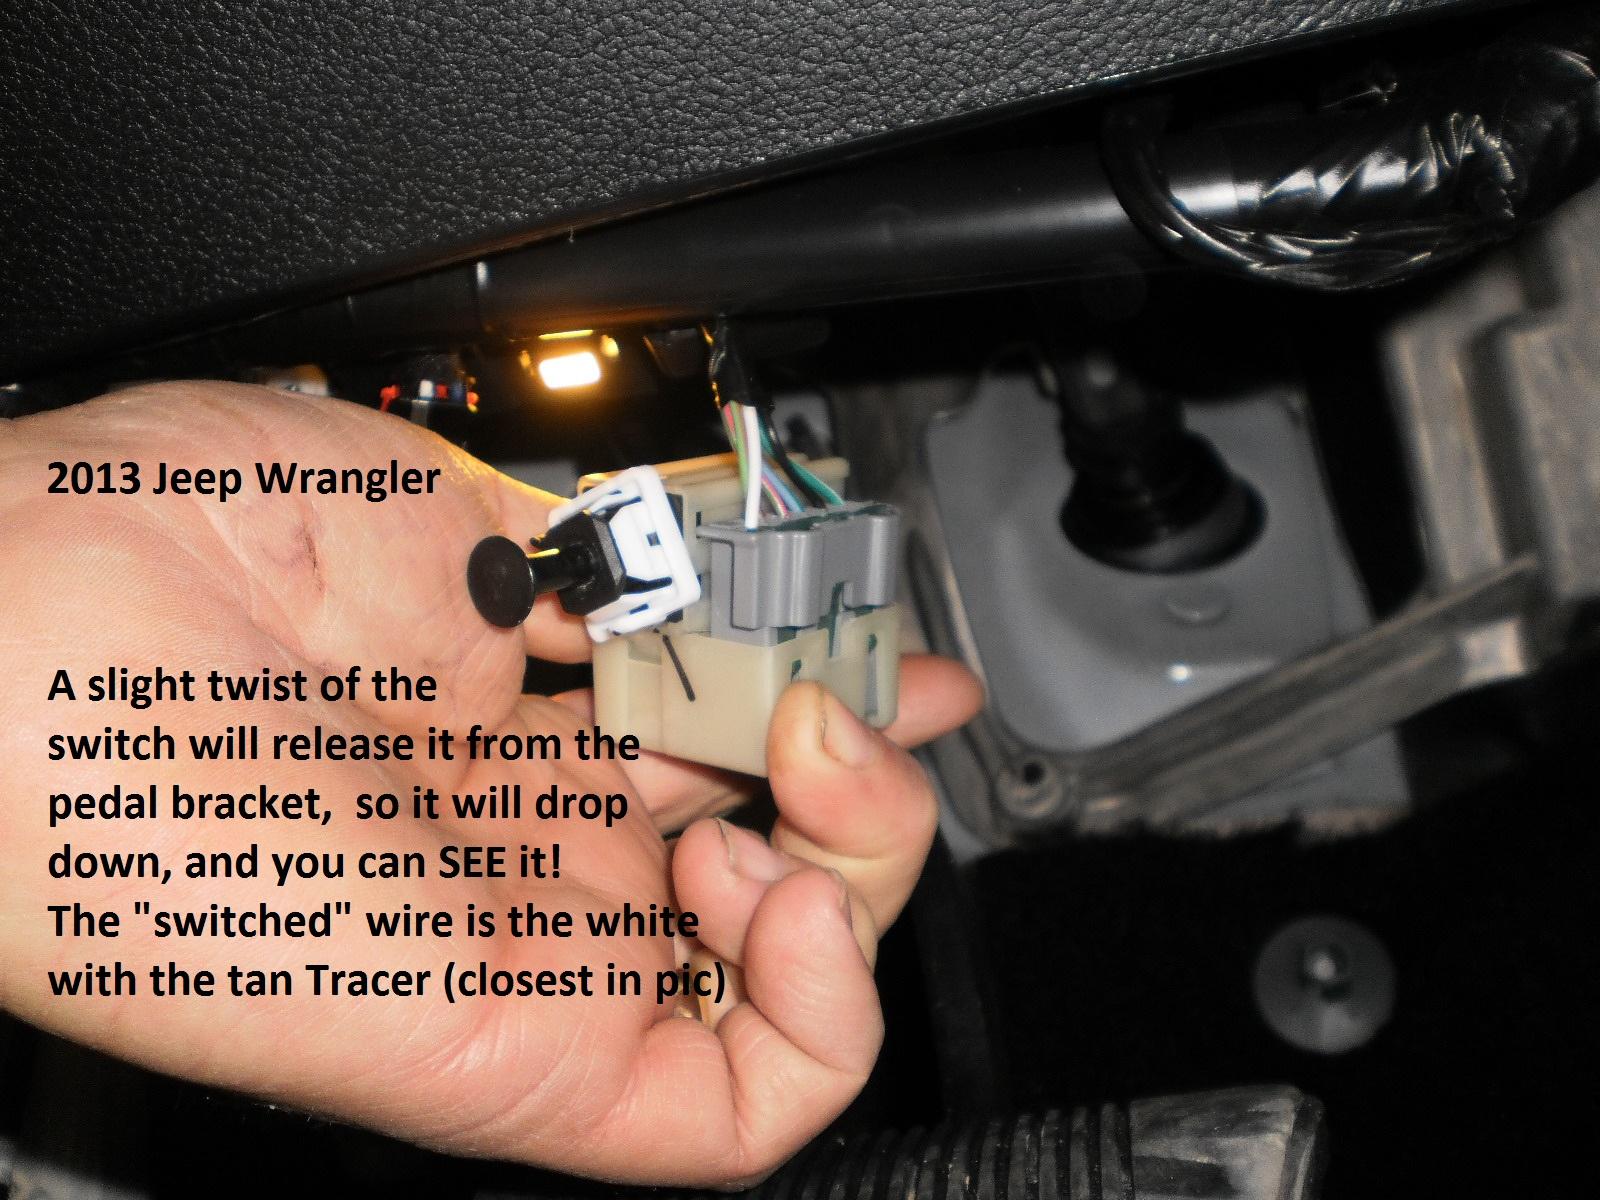 jeep wrangler tj wiring harness diagram 92 jeep wrangler trailer wiring diagram wiring diagram schematics  92 jeep wrangler trailer wiring diagram